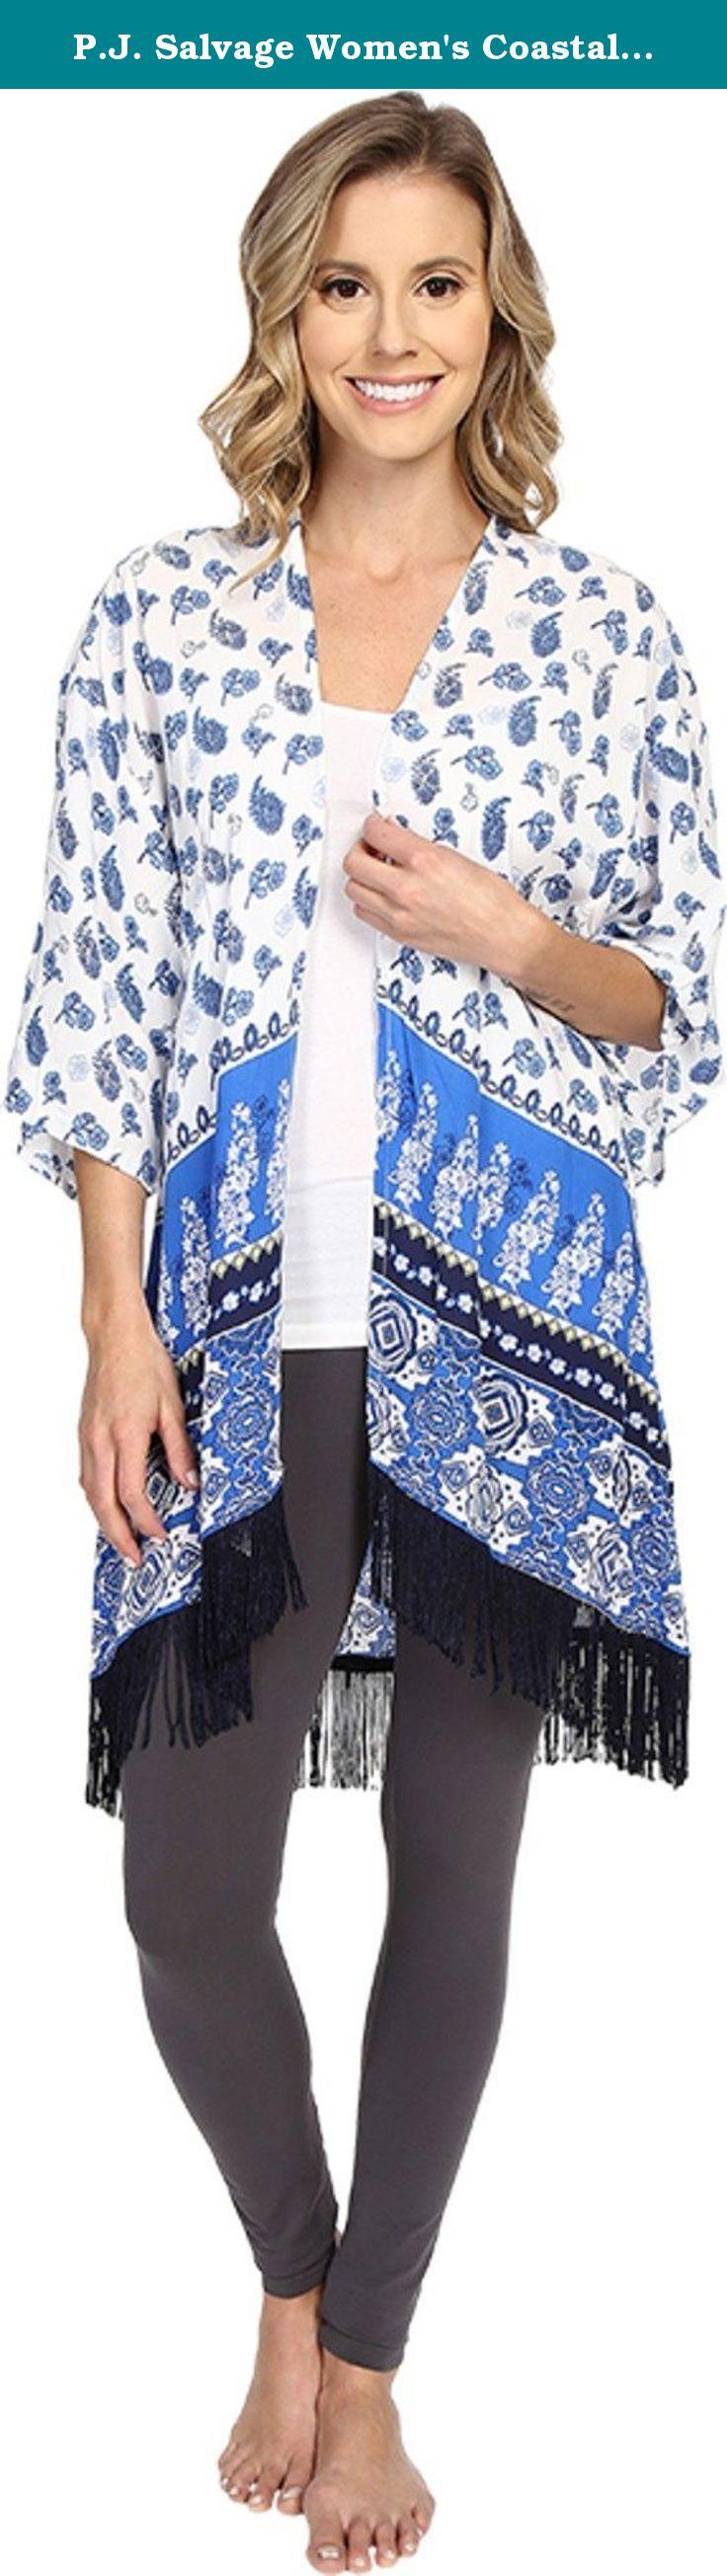 P.J. Salvage Women's Coastal Blue Print Kimono Ivory Pajama Top MD/LG. Coastal blue print throughout. Three quarter sleeves with large arm holes. Fringe along the hemline. 100% rayon. Machine wash cold, tumble dry low.